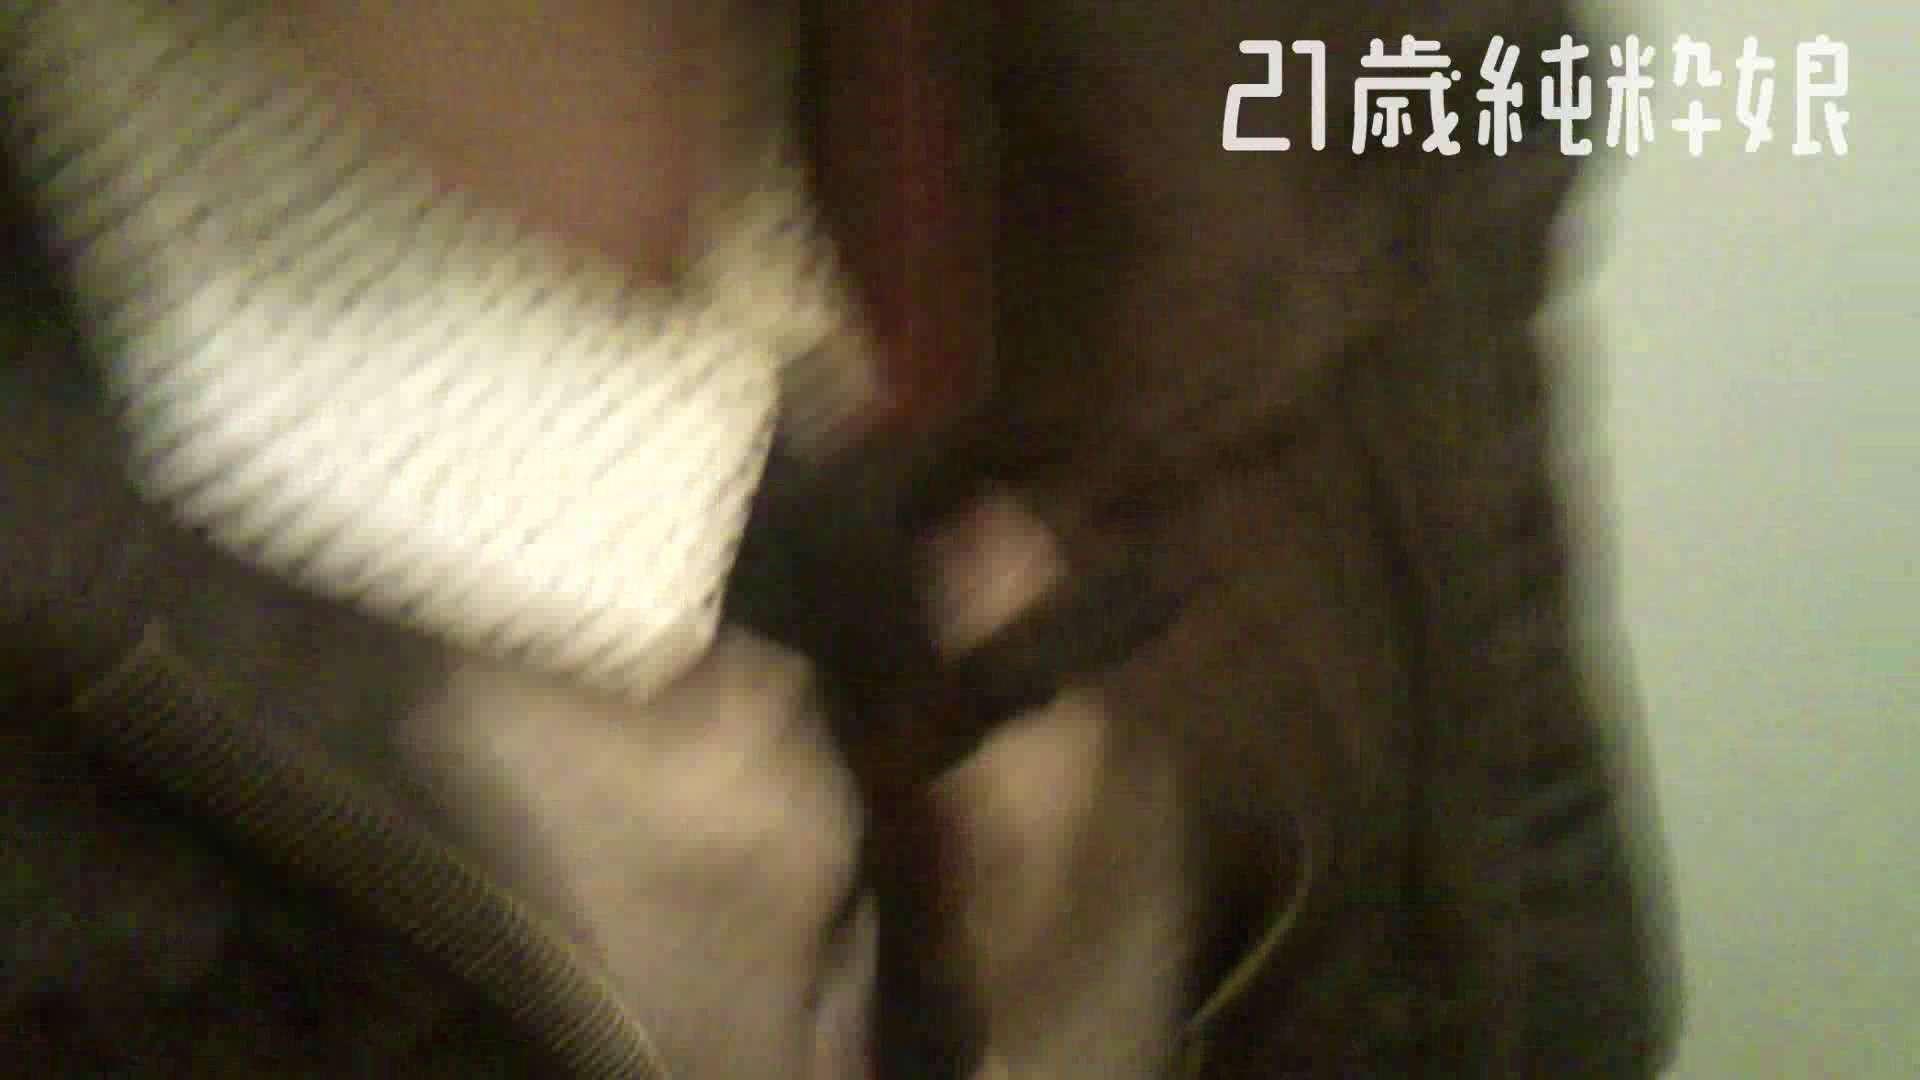 Gカップ21歳純粋嬢第2弾Vol.5 美女OL  78連発 60